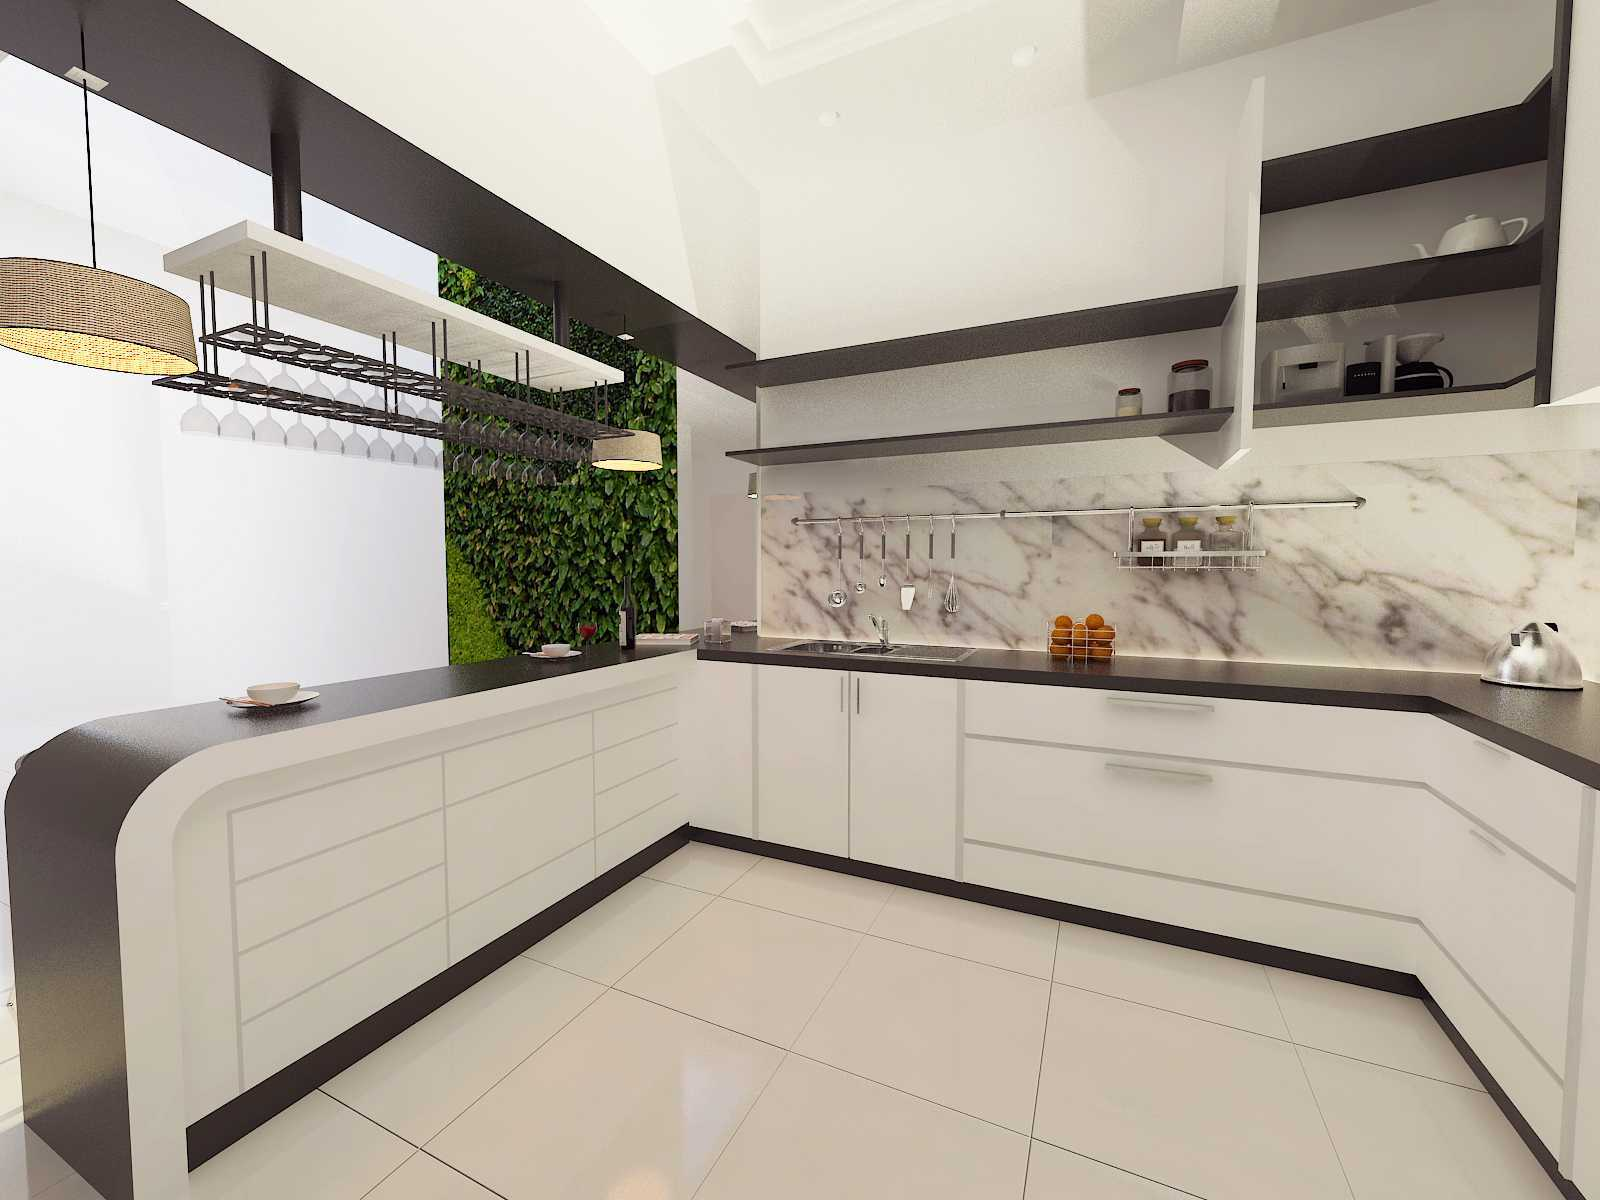 Archdesignbuild7 project kitchen set jalan permata permai raya cisaranten kulon arcamanik kota bandung